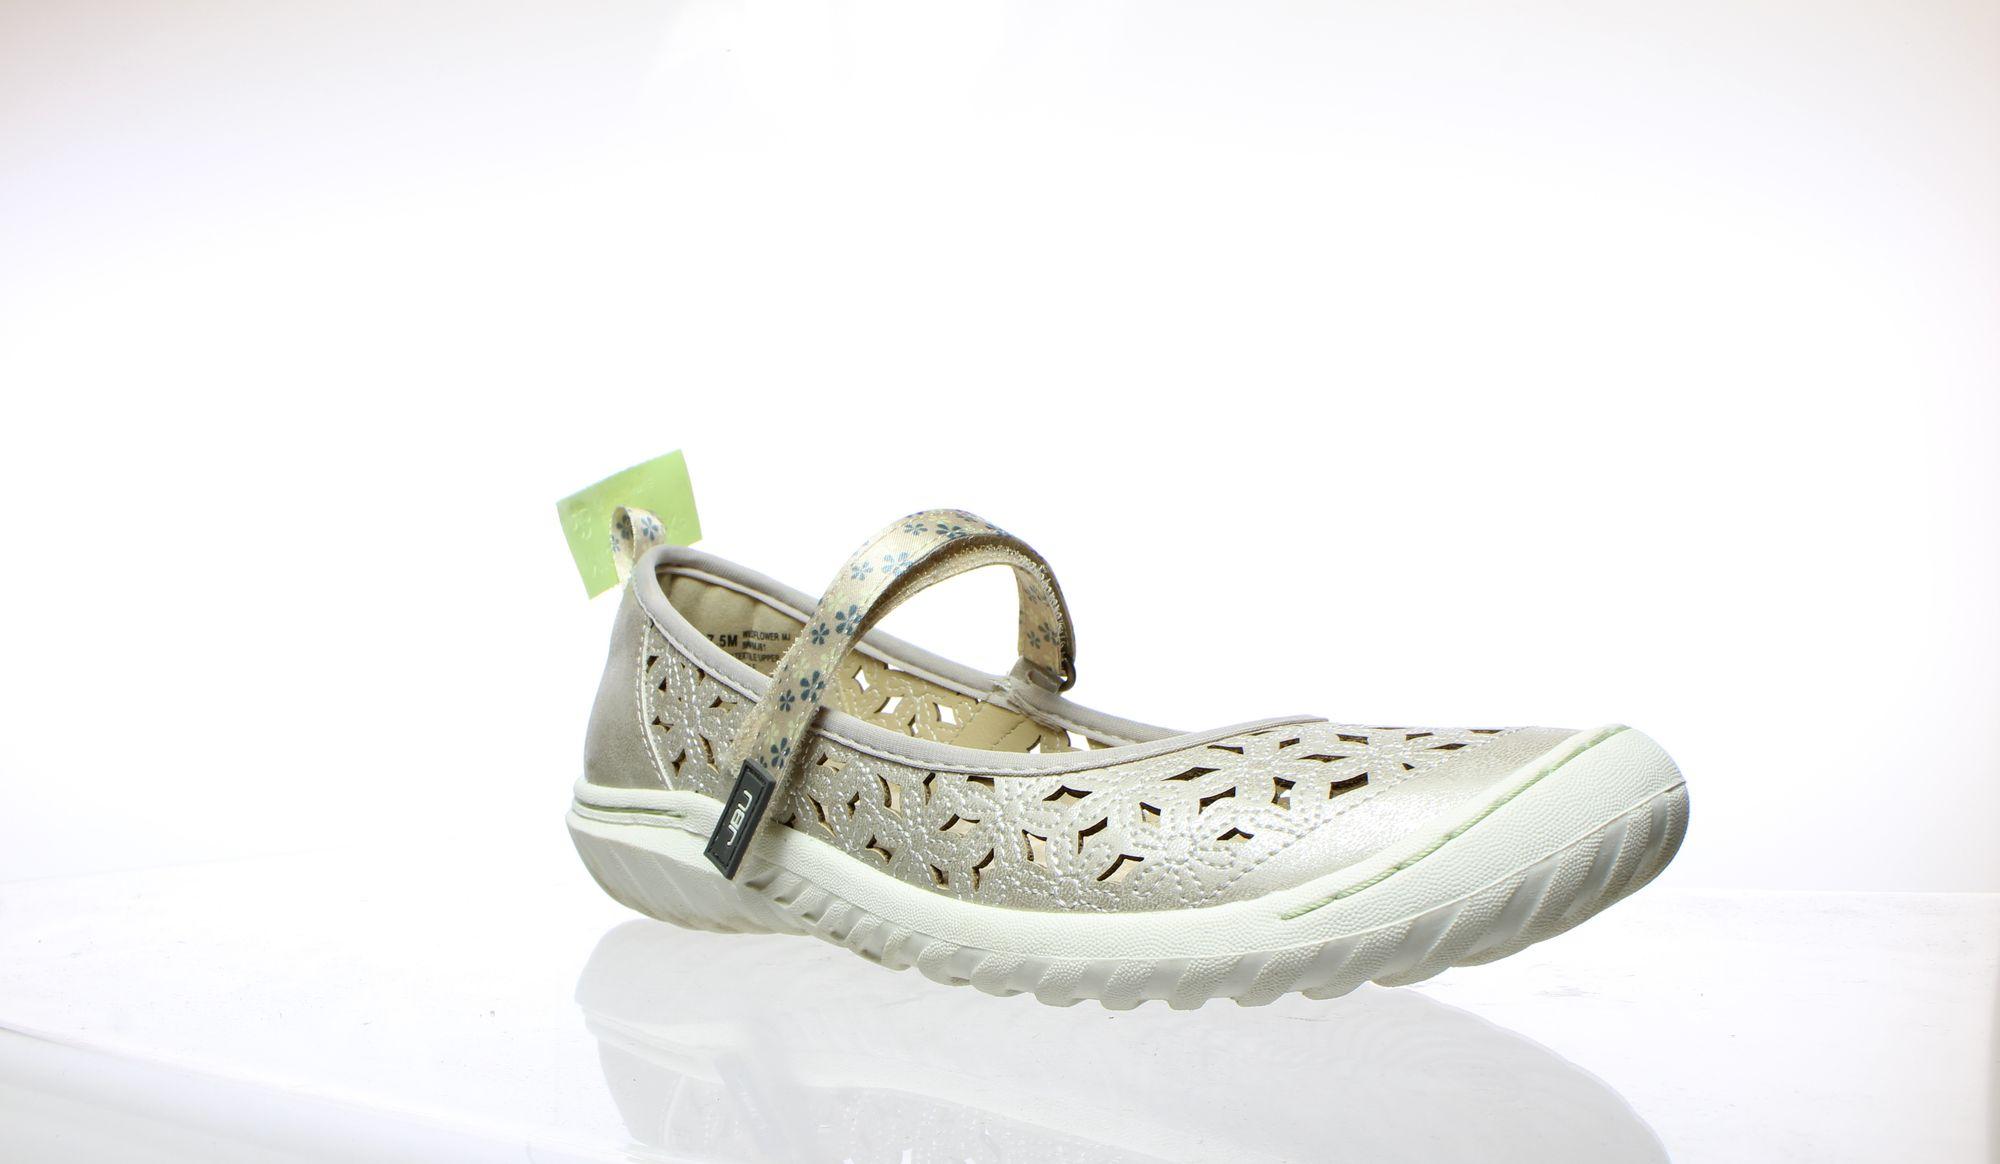 Jambu Womens Wildflower Cream Shimmer Sport Sandals Size 7.5